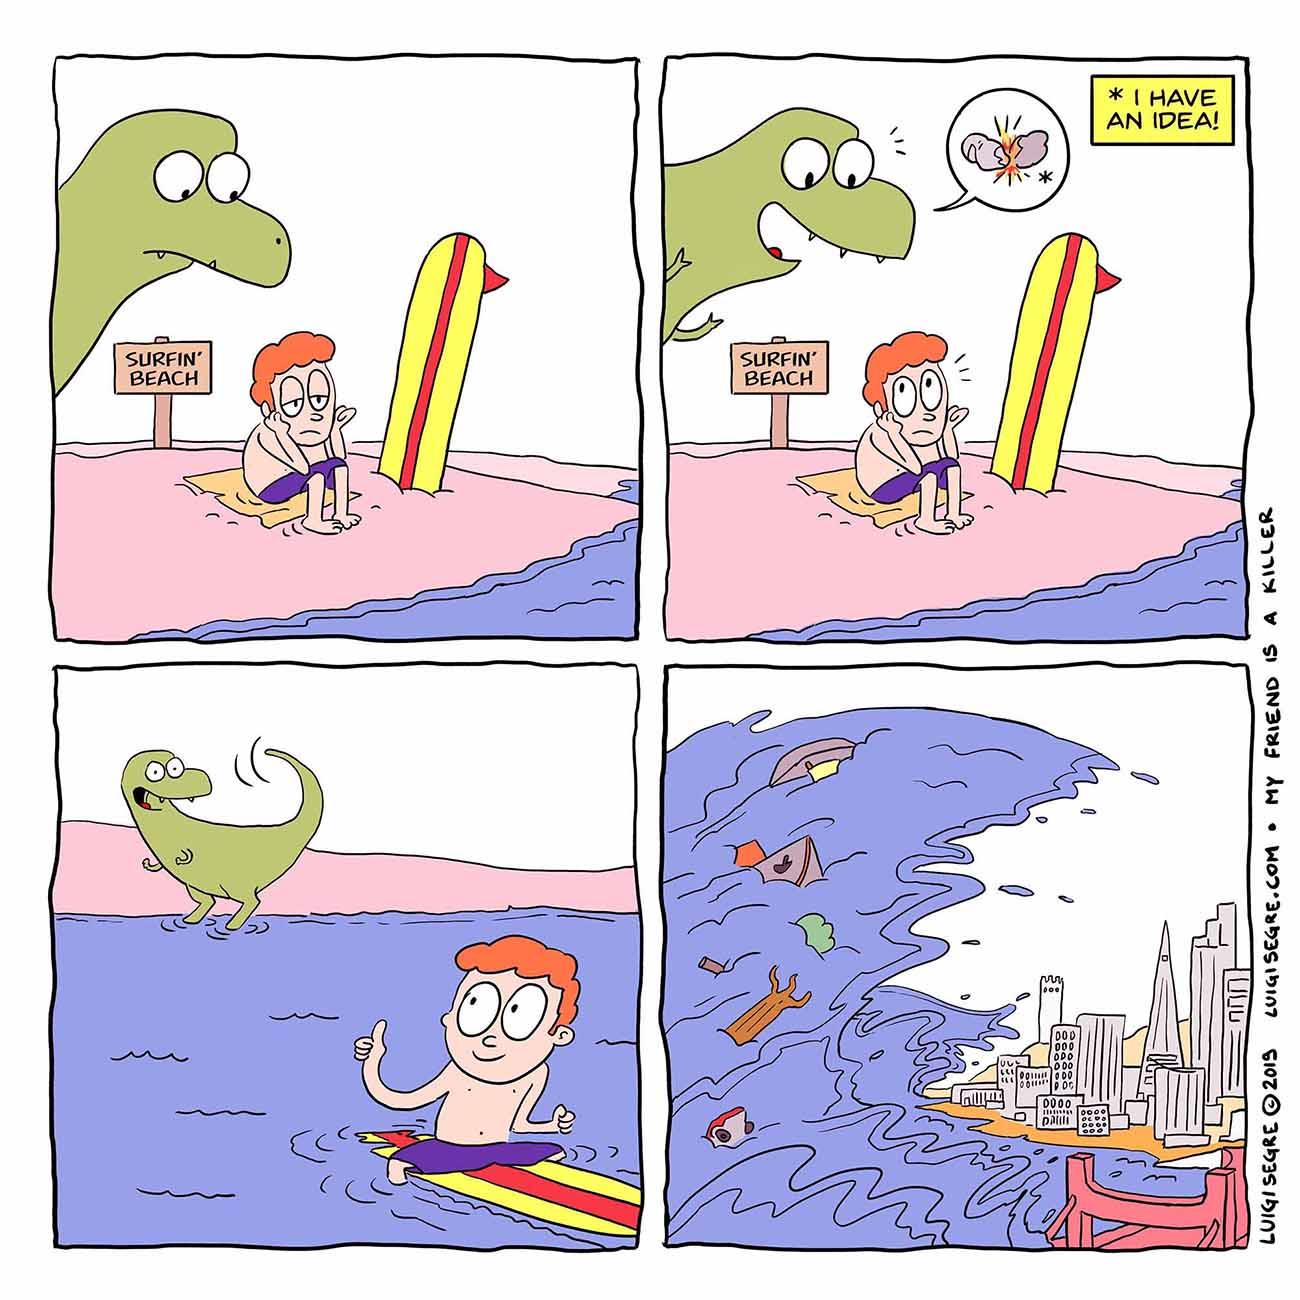 Contenuti_Low_Res_Luigi_Segre_Cartoons_2019_my_friend_is_a_killer_09.jpg